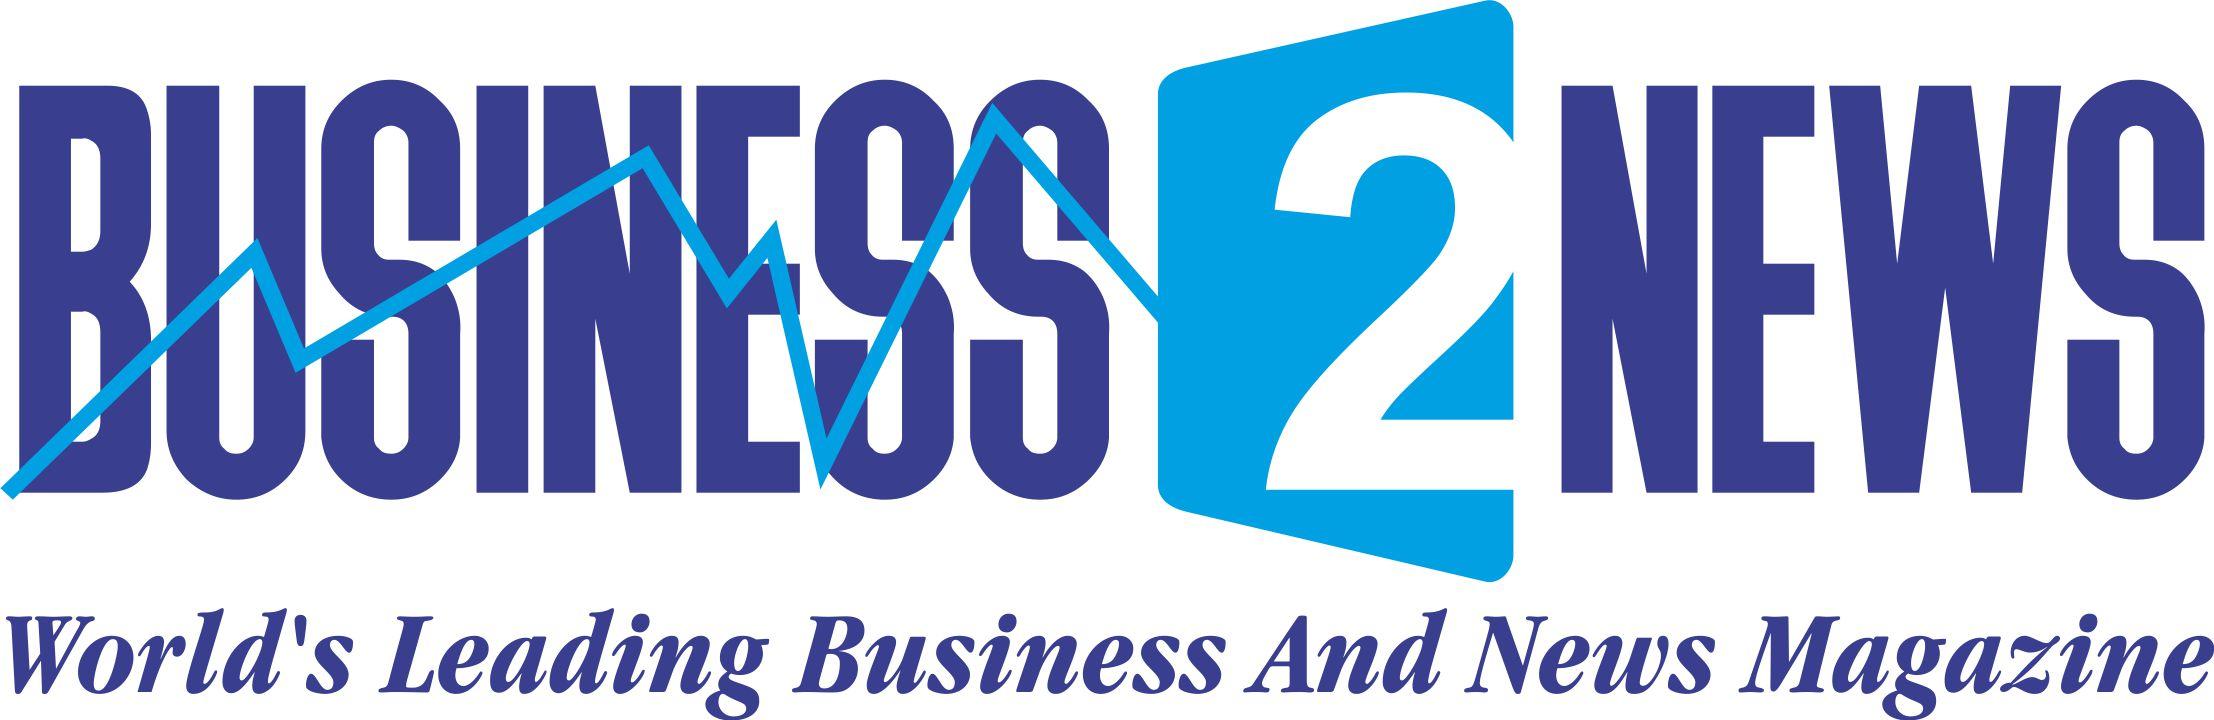 Business2News_logo JPG